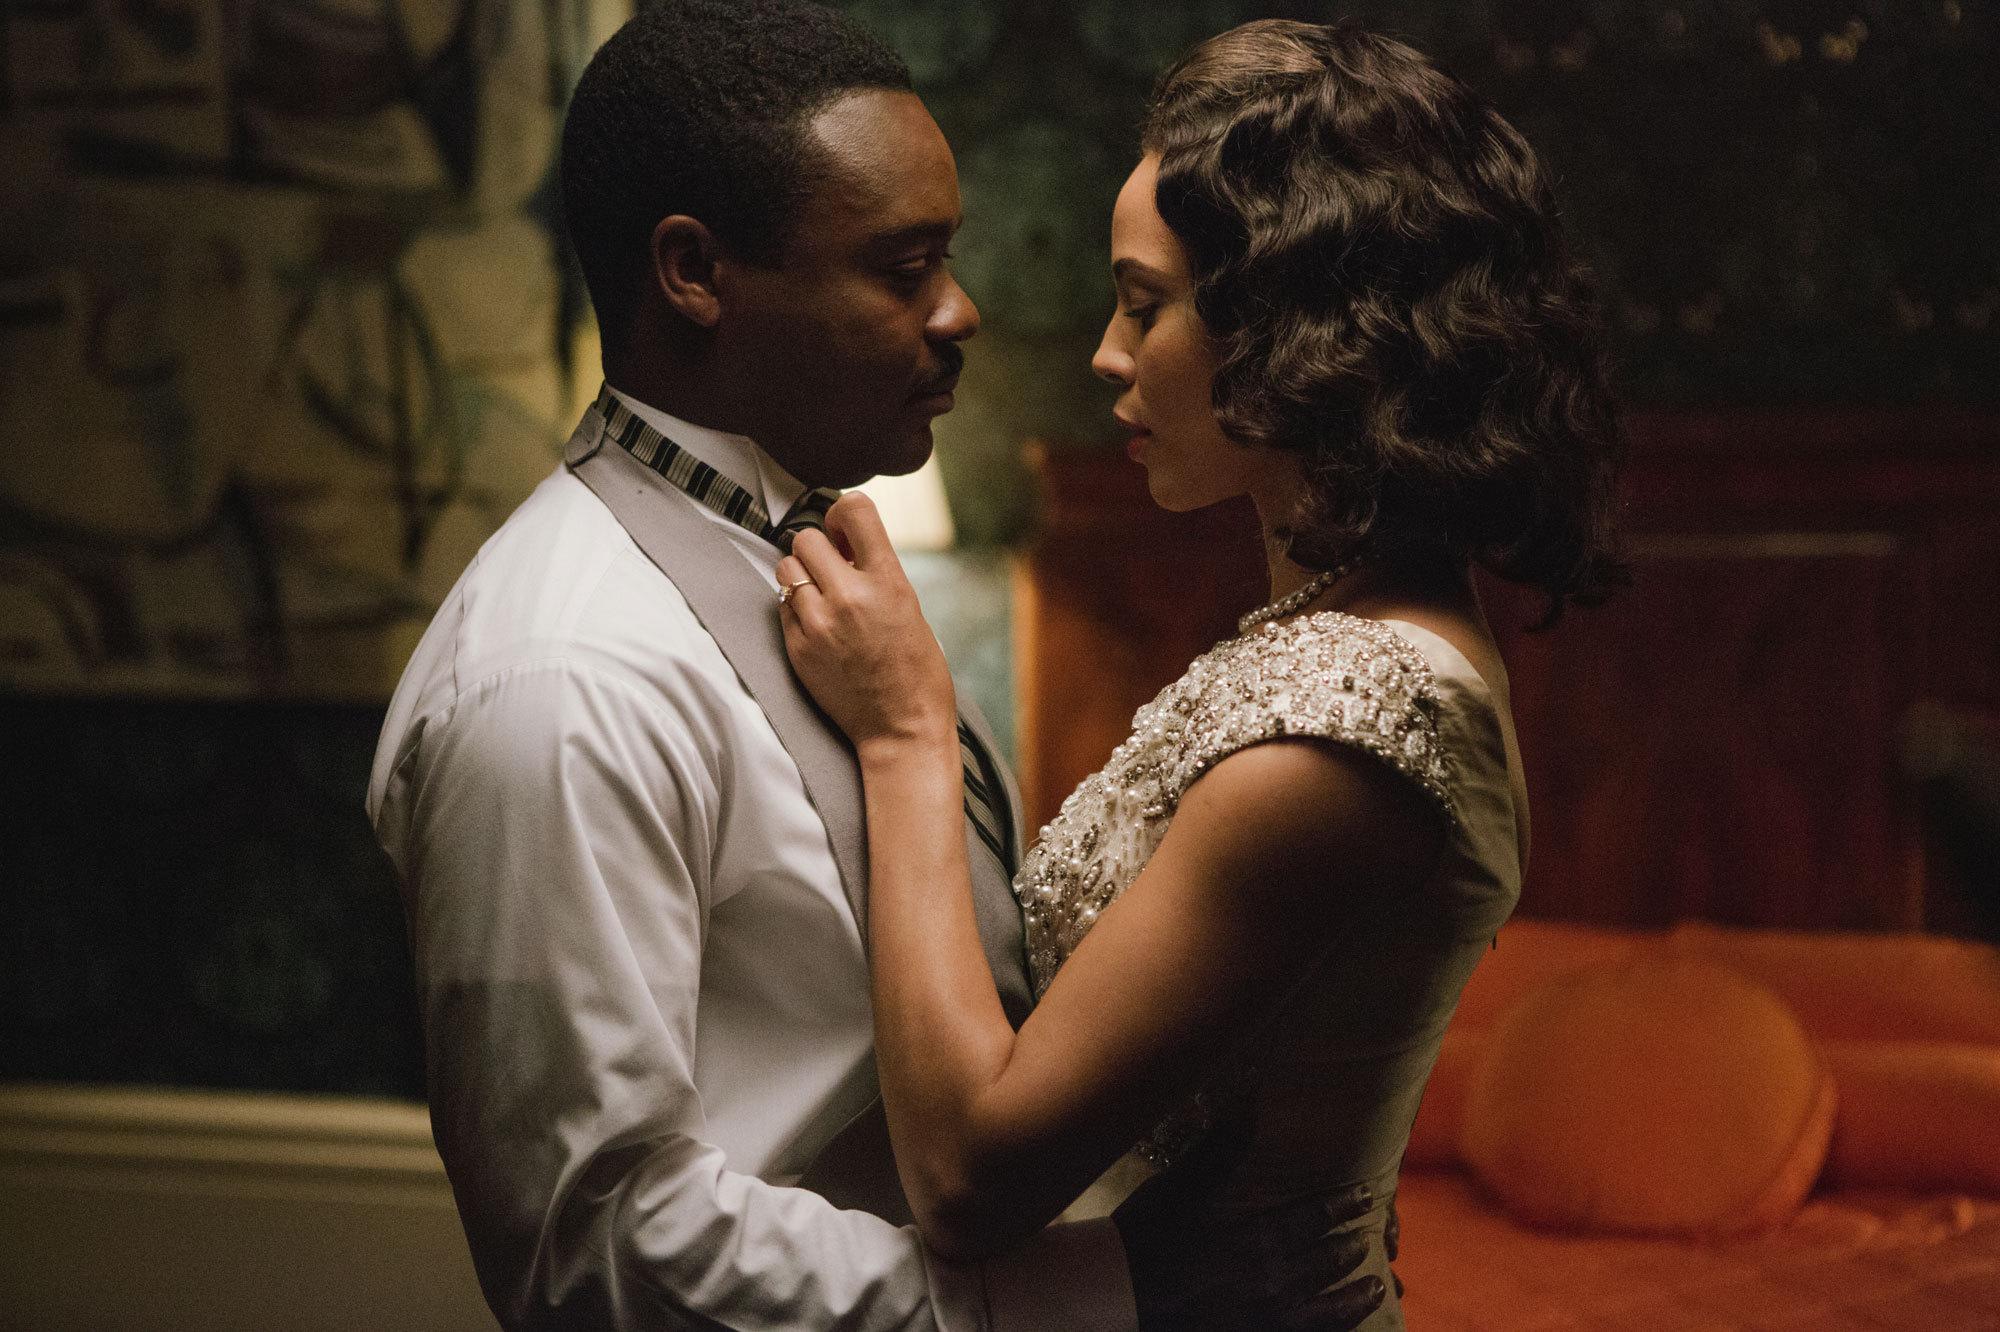 How One Of Gospel's Essential Songs Gave 'Selma' Its Soul